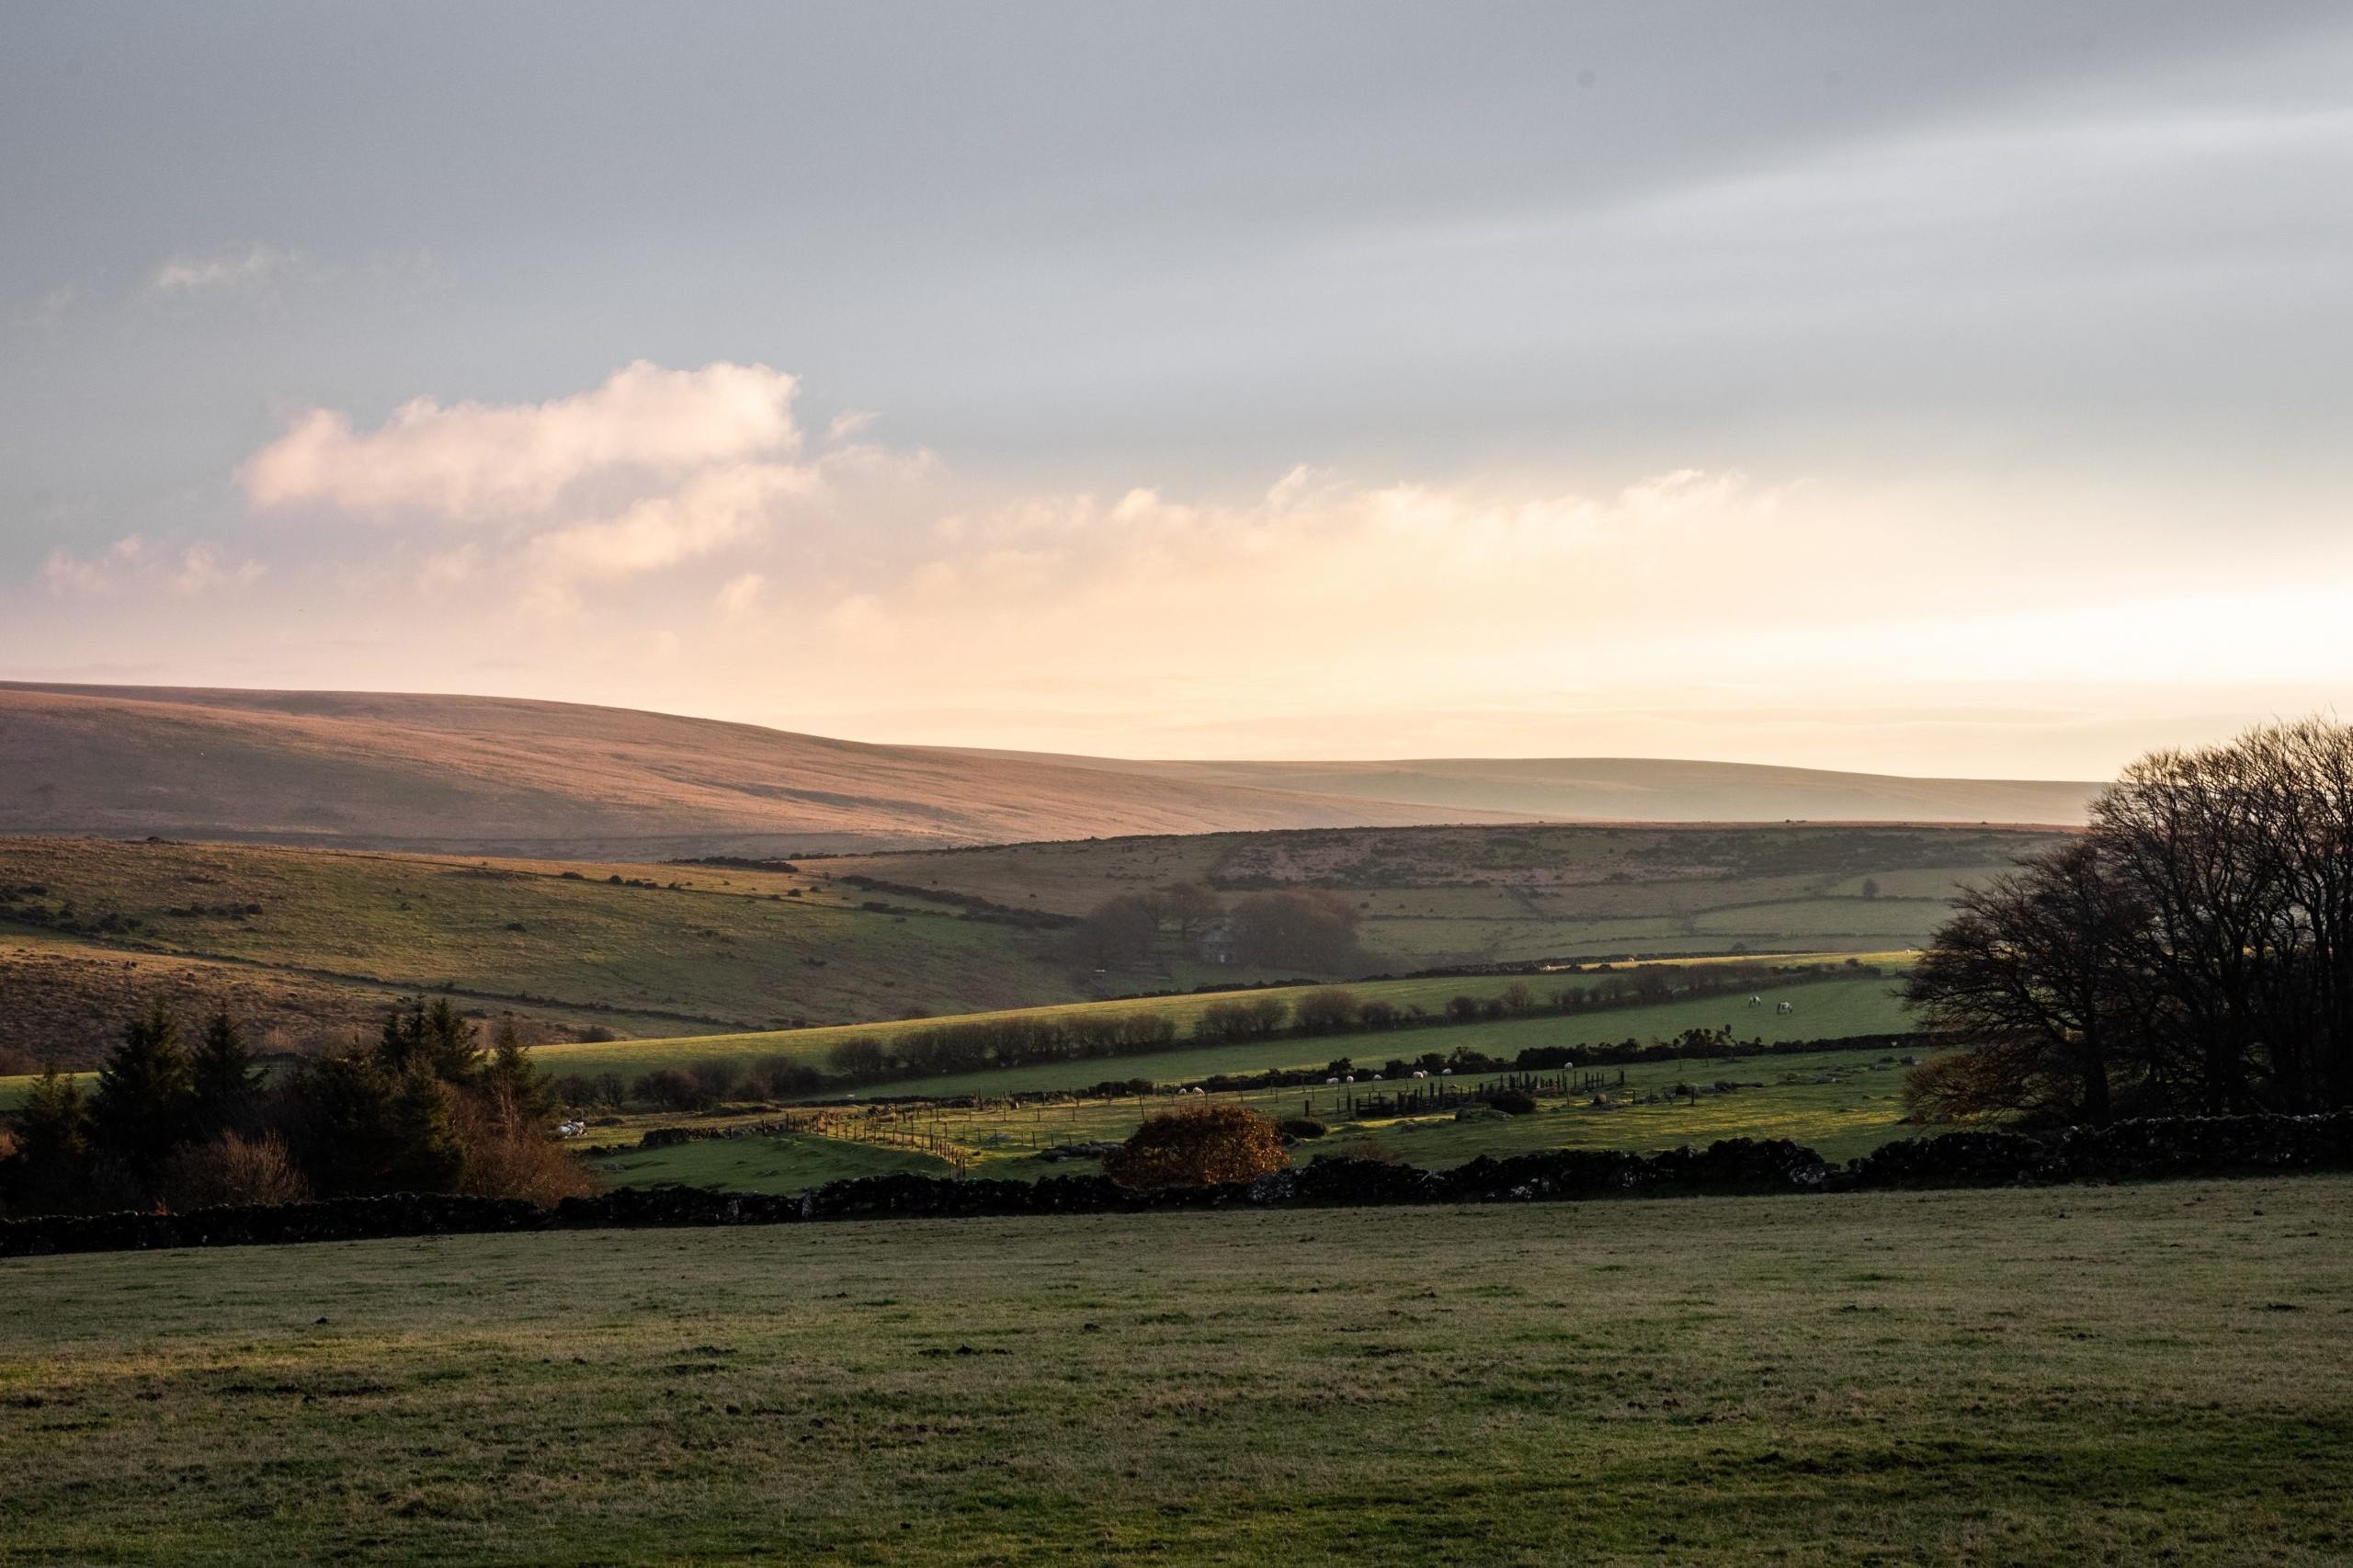 Dartmoor Landscape photograph